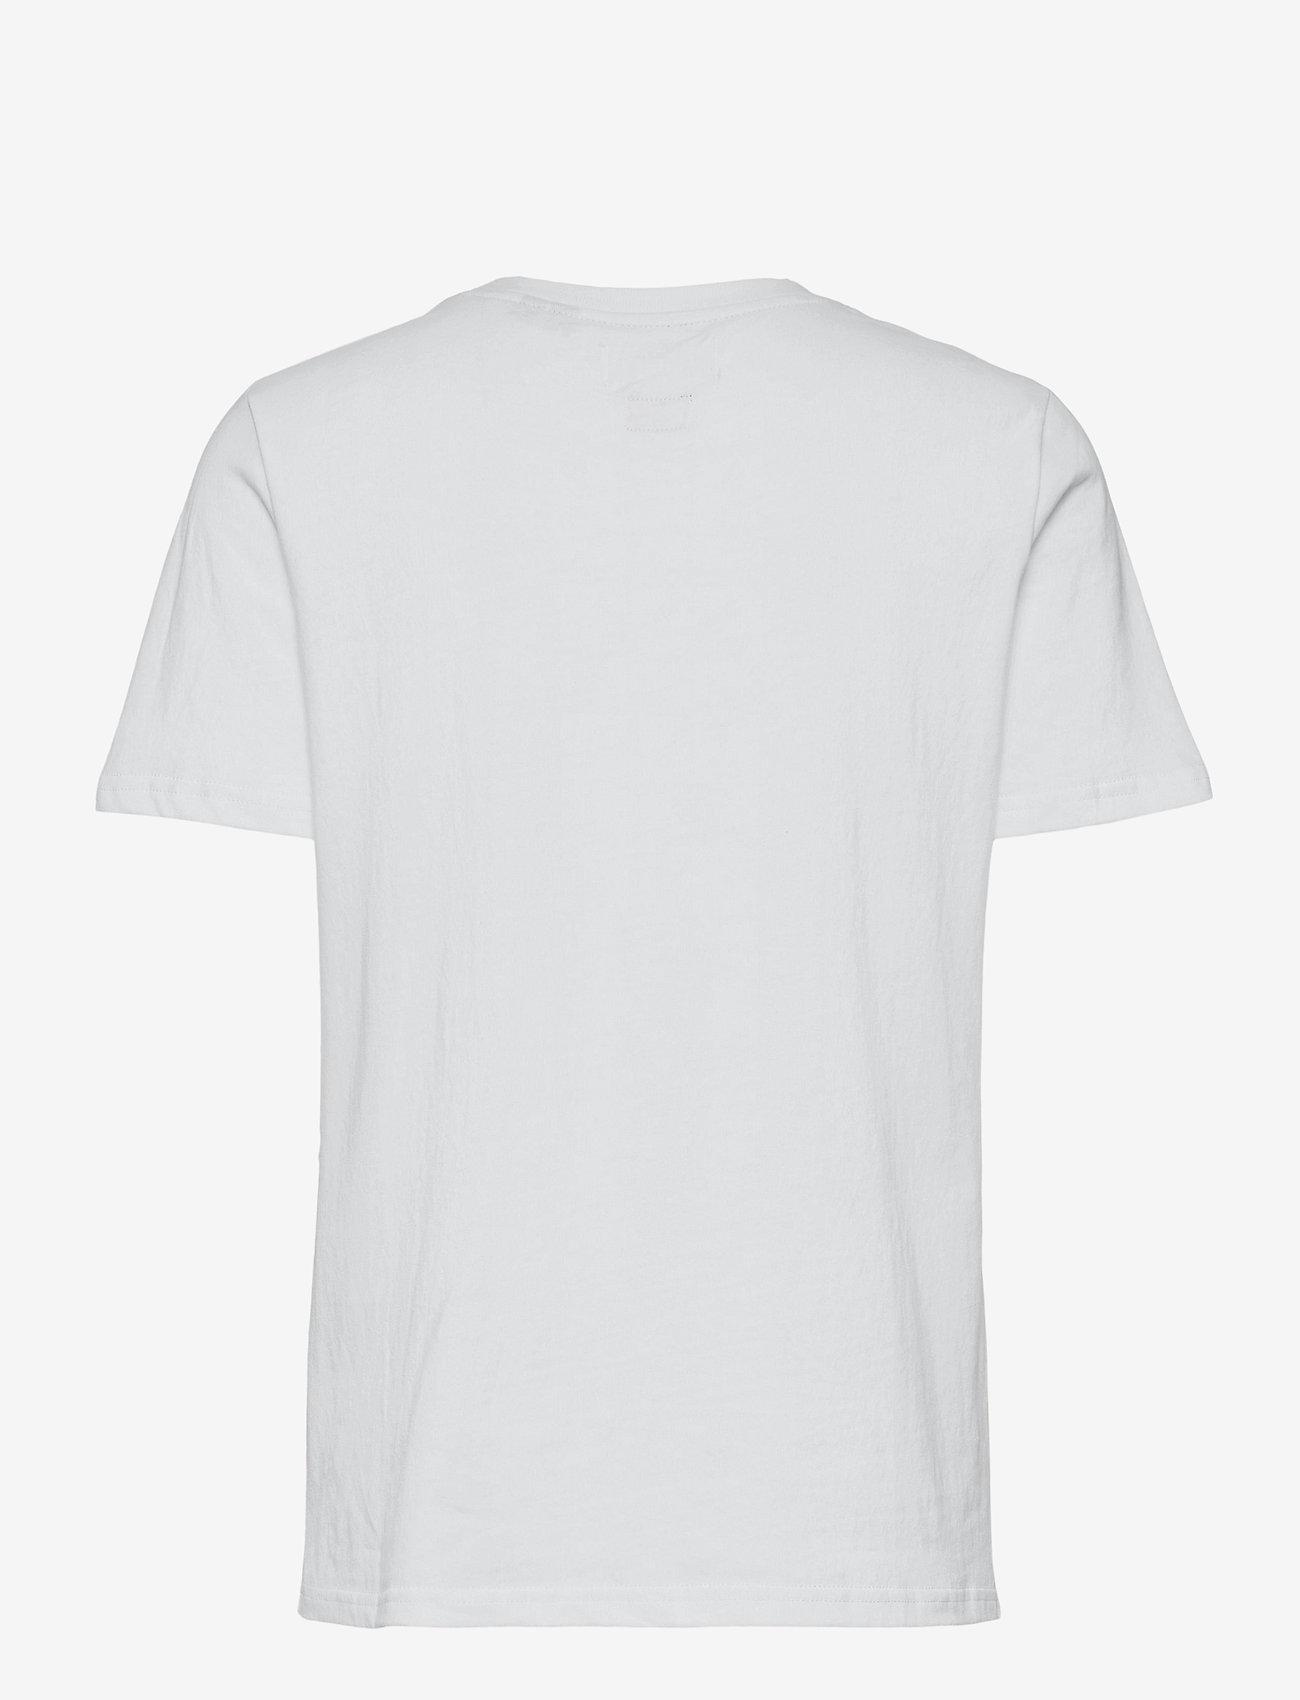 Superdry - COLLEGIATE CALI STATE TEE - t-shirt & tops - optic - 1